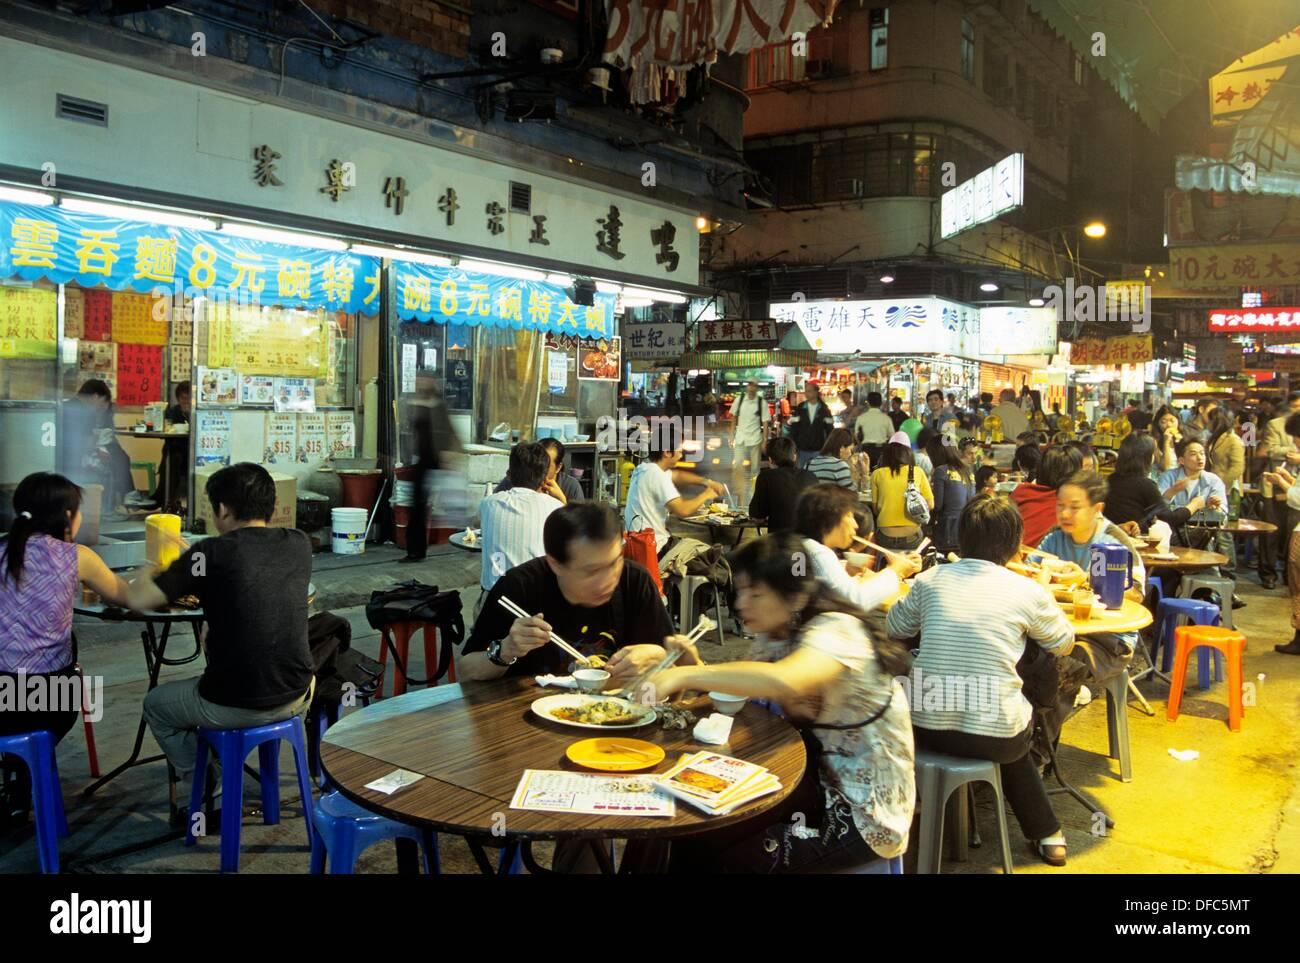 Cheap Restaurants In The Street Kowloon Peninsula Hong